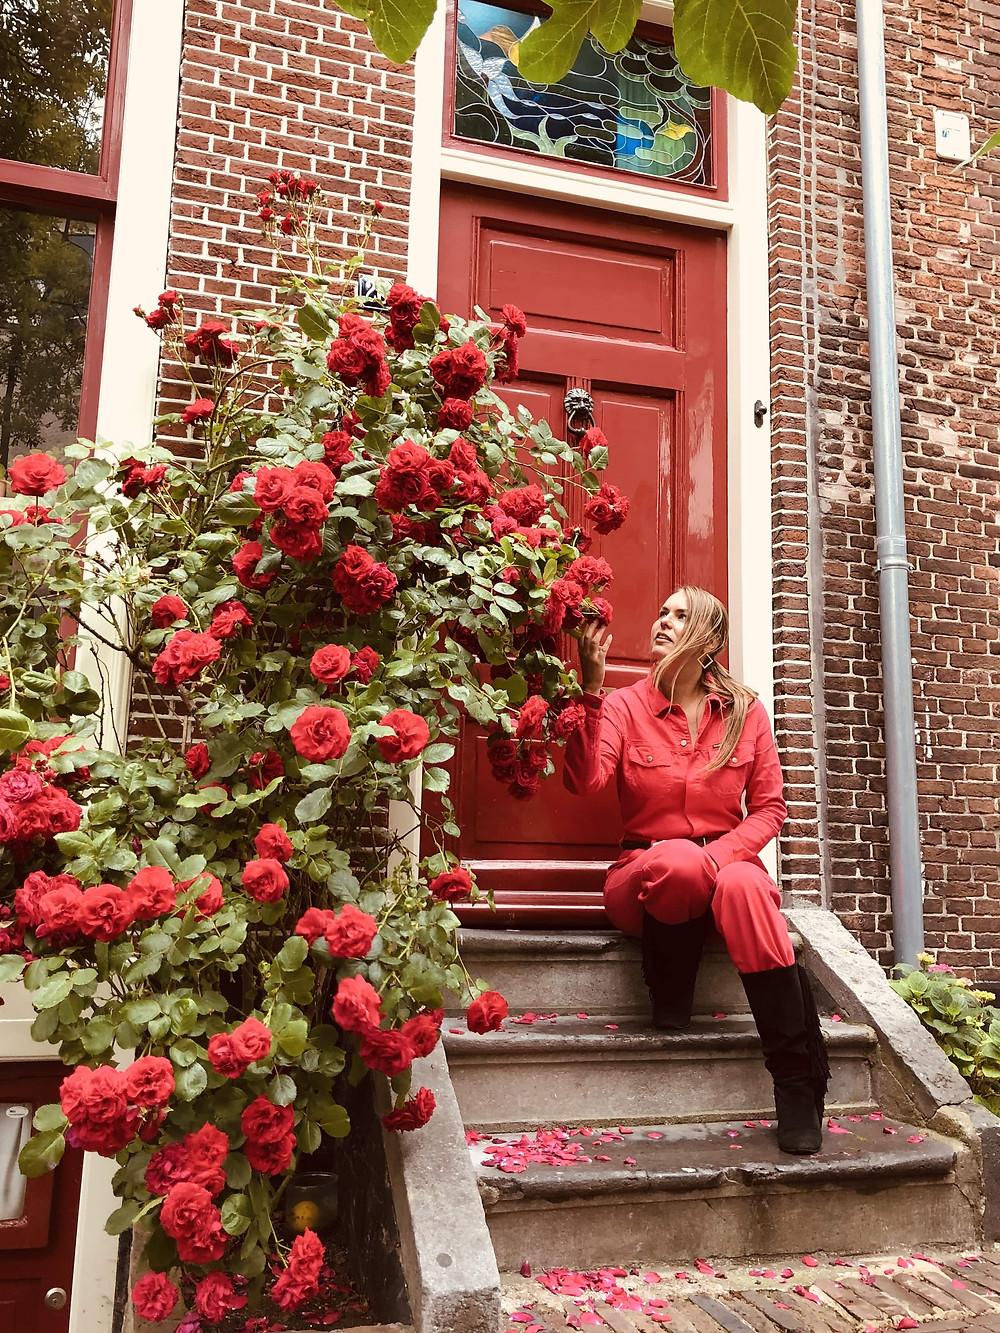 Leiden quaint houses and flowers Netherlands citytrip